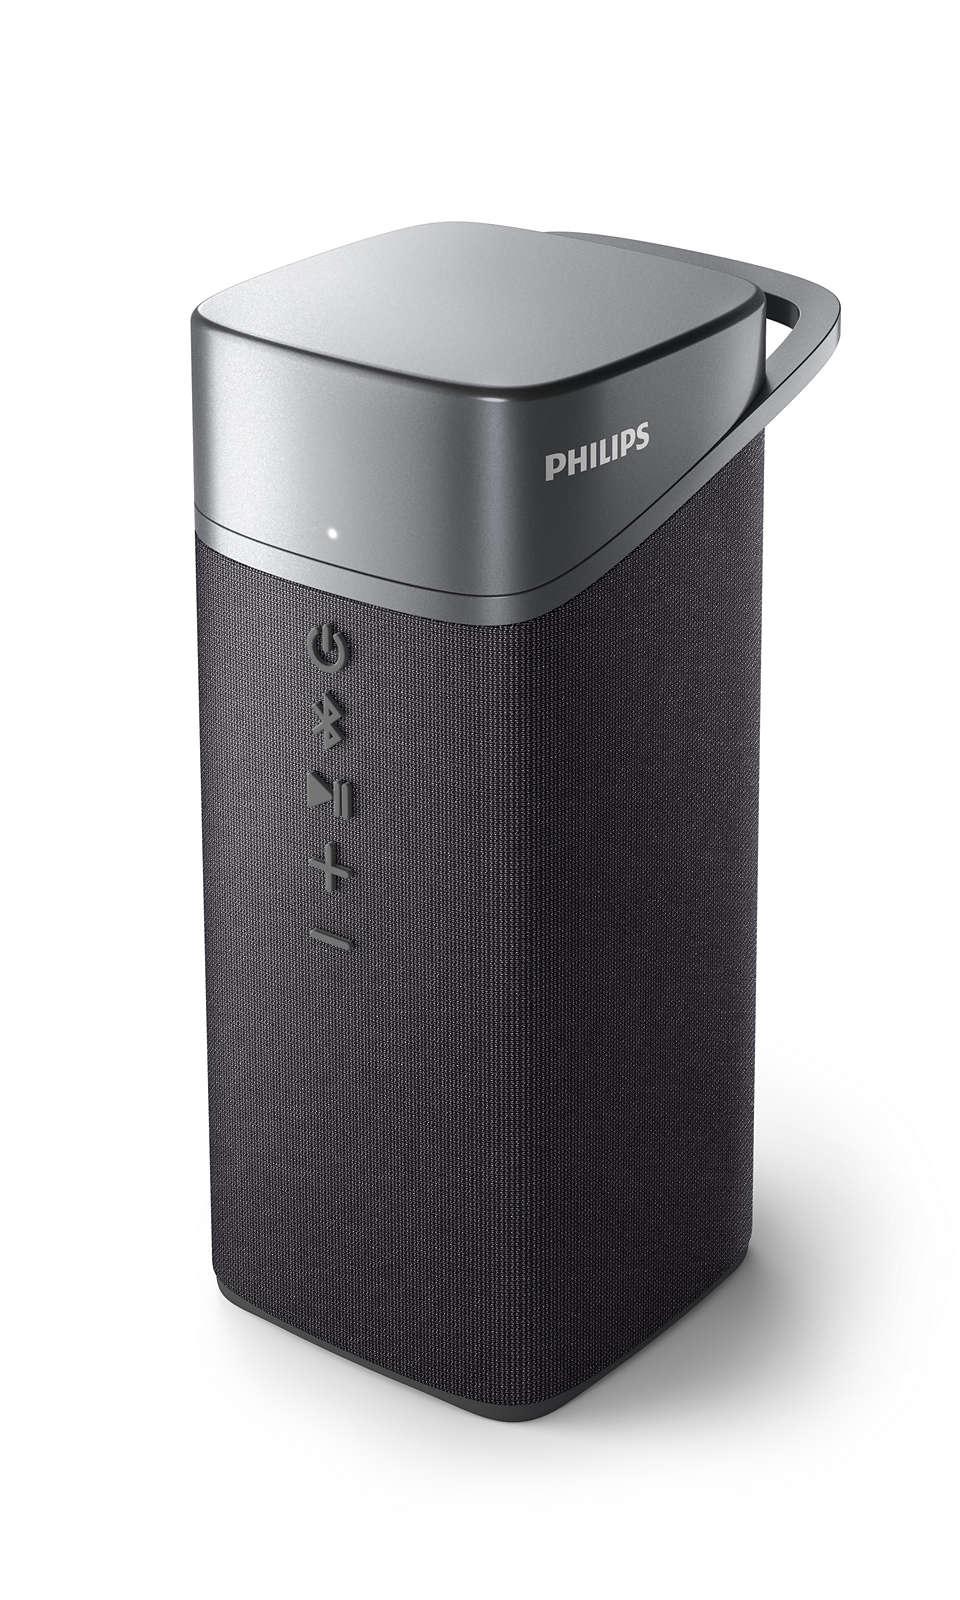 Philips TAS3505/00 portable speaker 5 W Mono portable speaker Grey